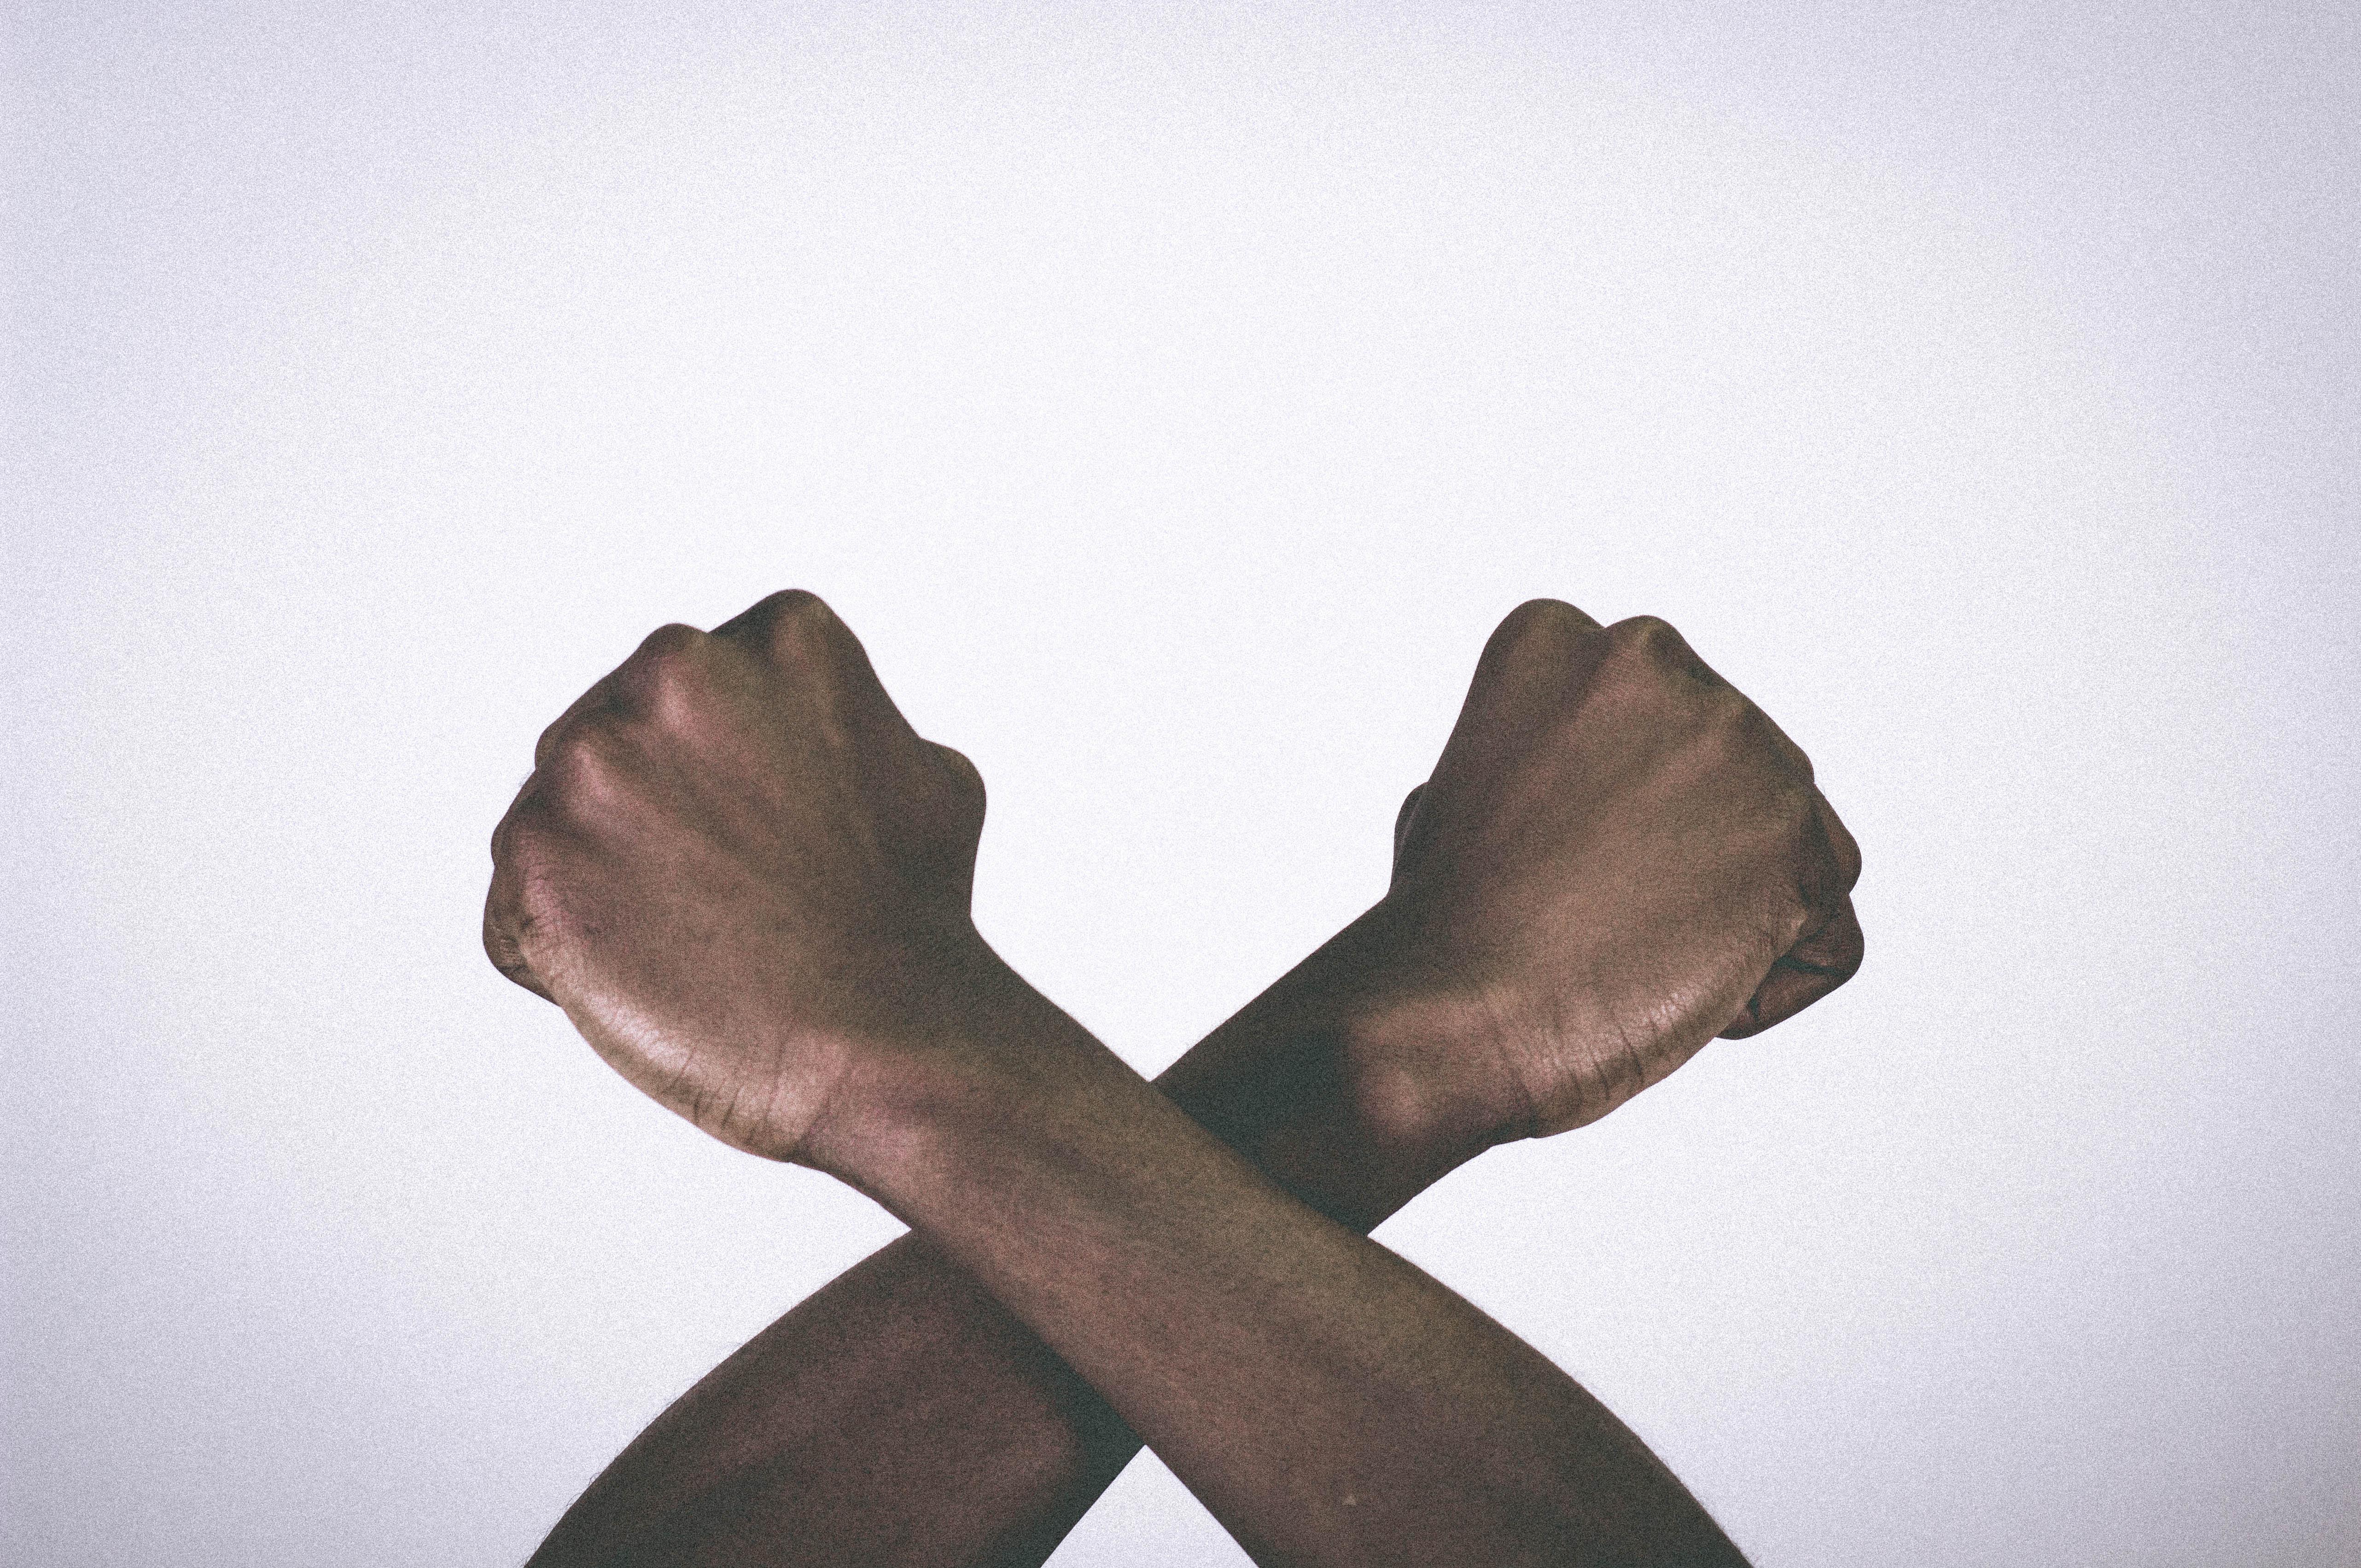 Charles_Spangler-RacialDiscrimination